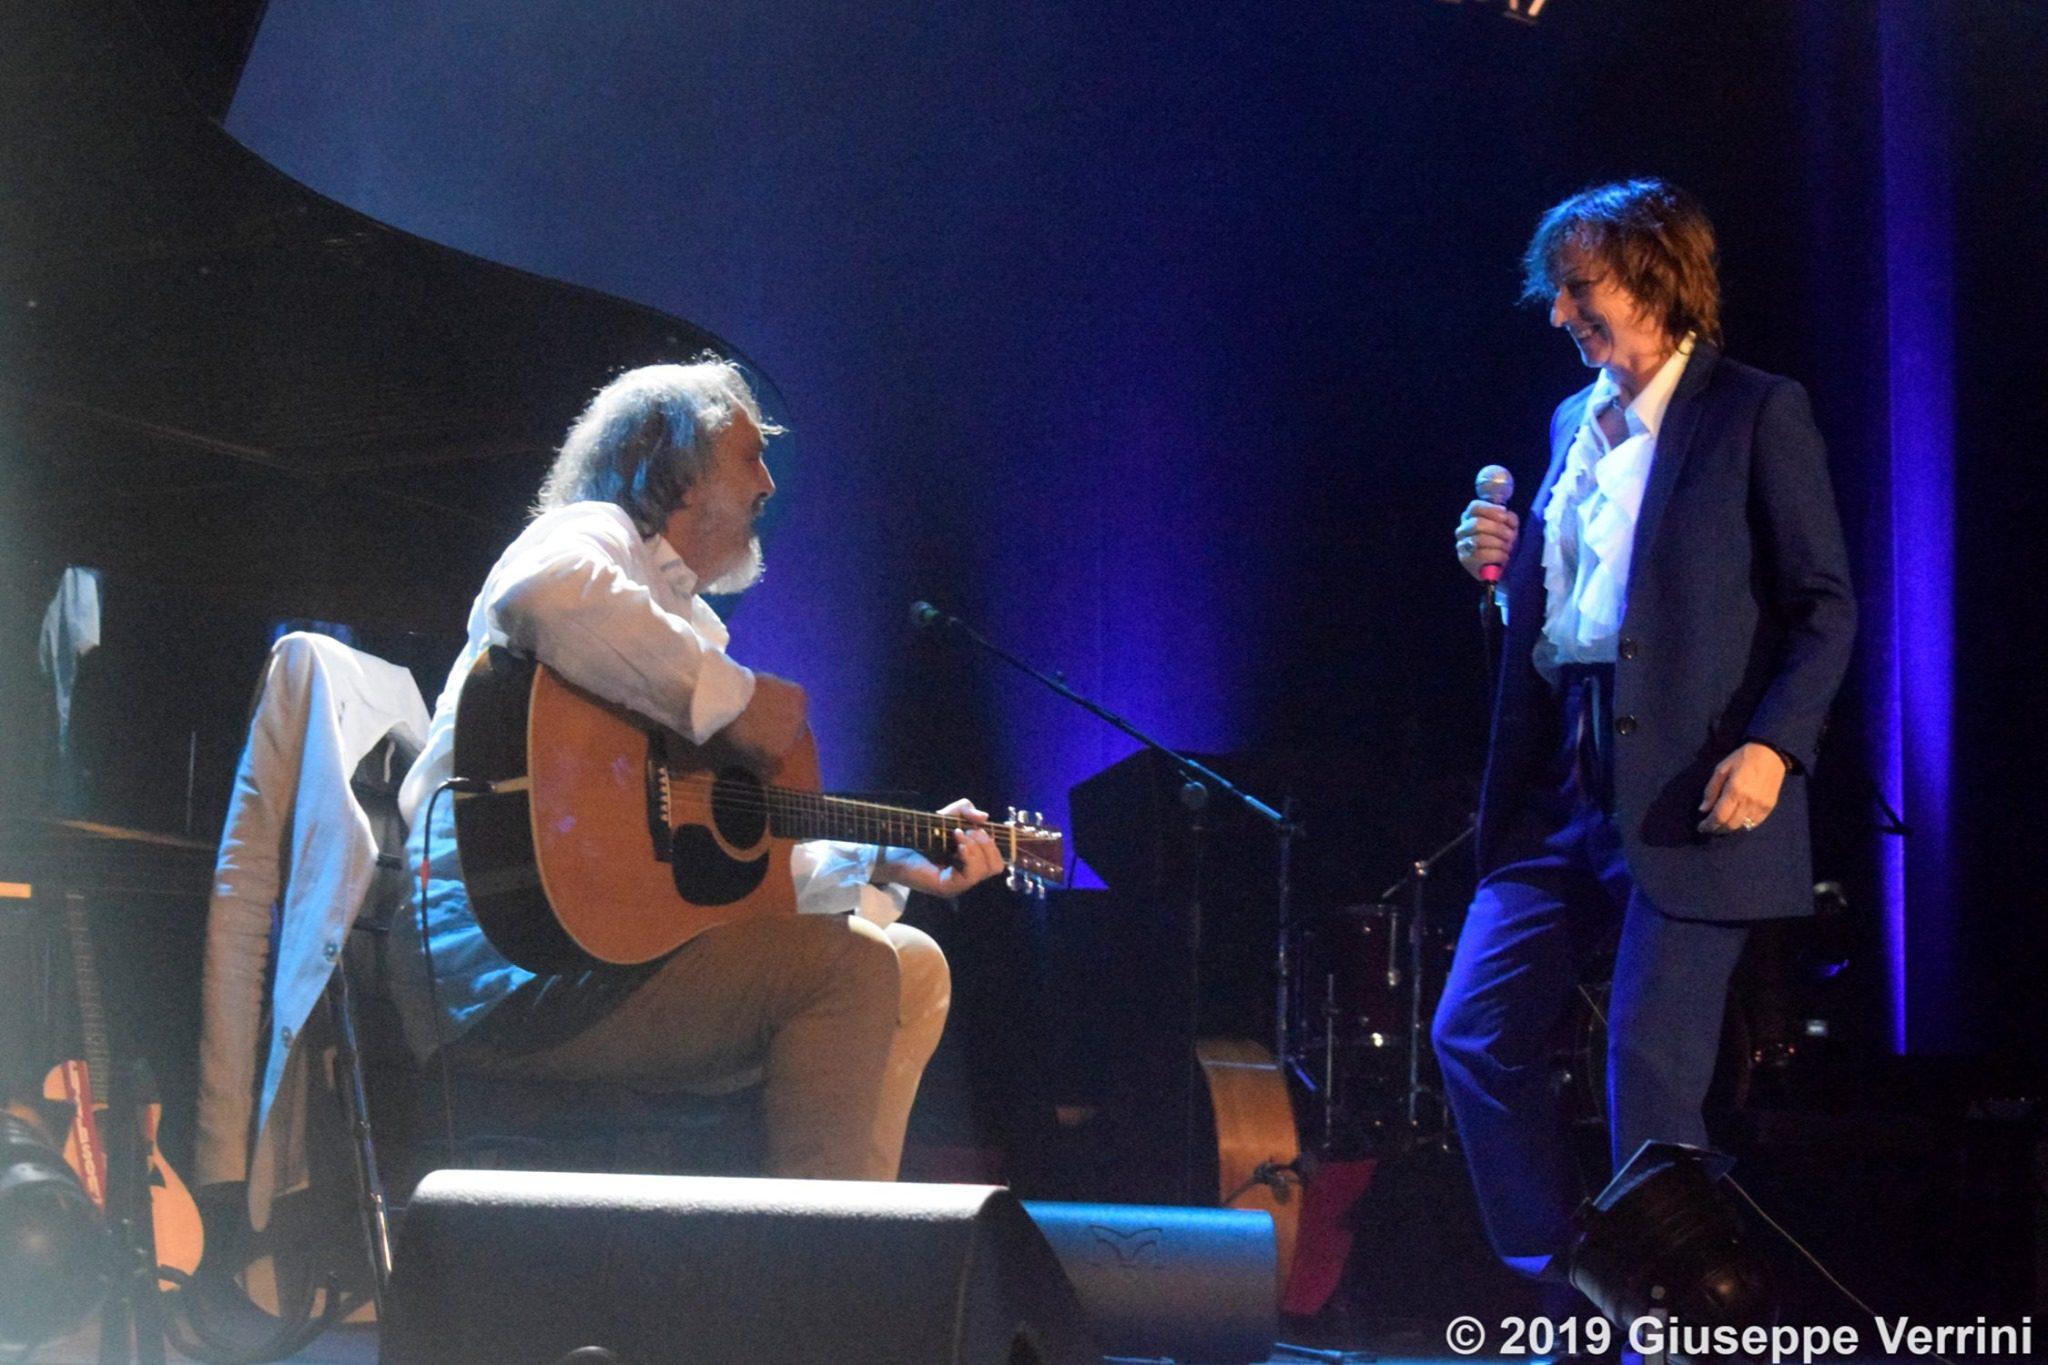 Mauro Paoluzzi e Gianna Nannini Live – Foto di Giuseppe Verrini